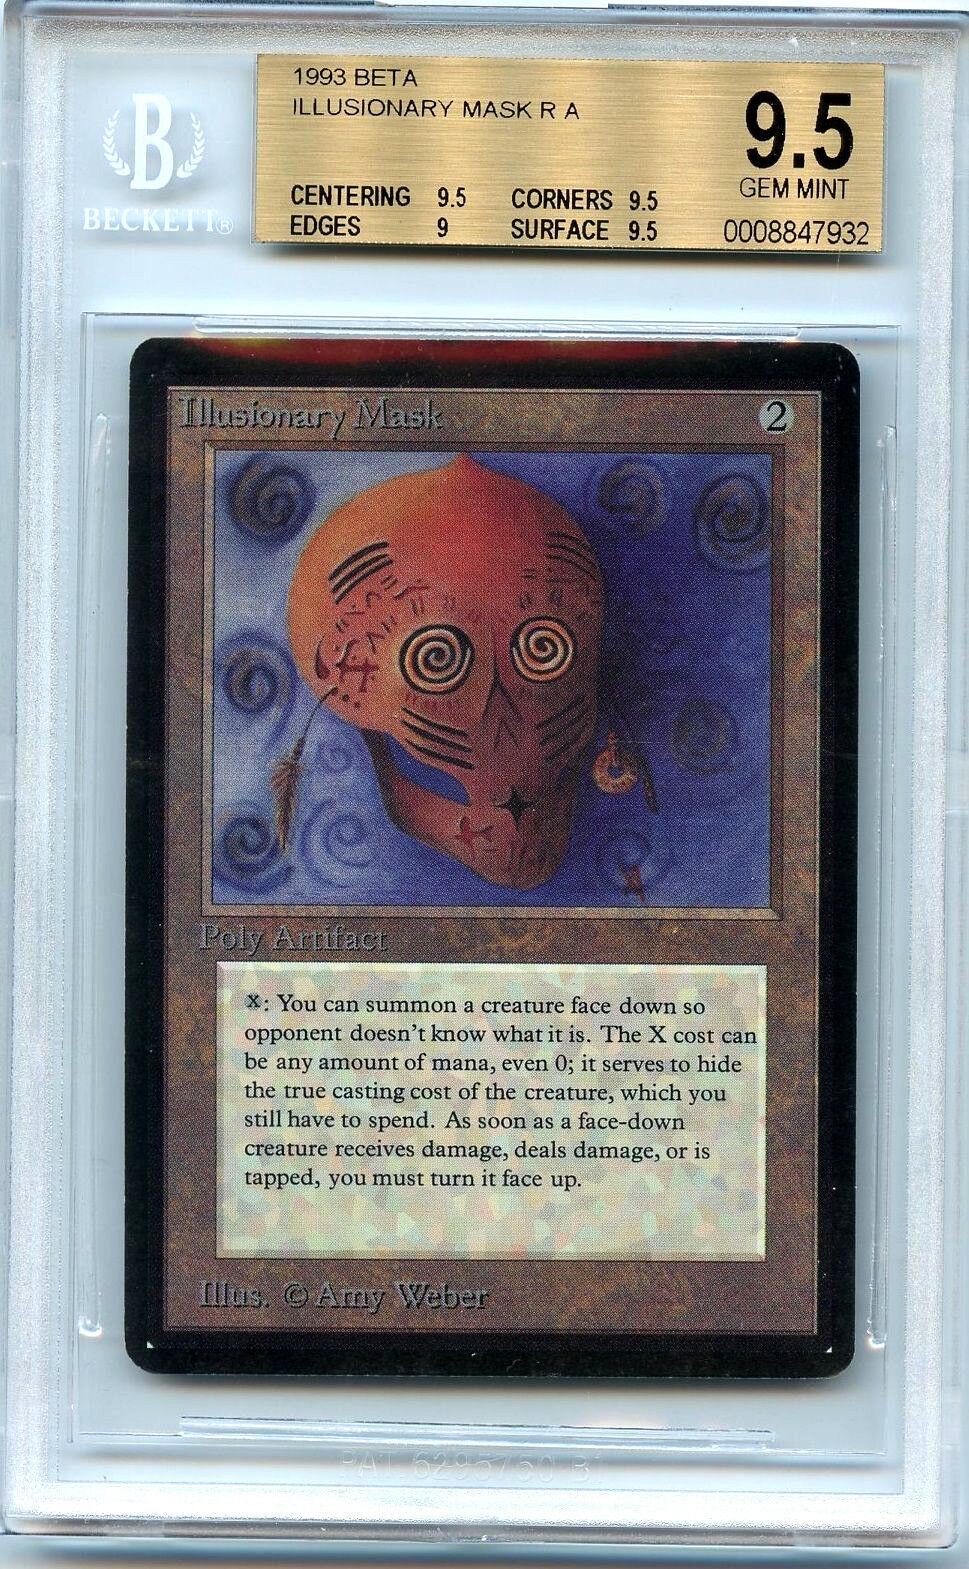 Mtg beta eingebildeten maske bgs eingestuften 9,5 gem - magic the gathering wotc 7932